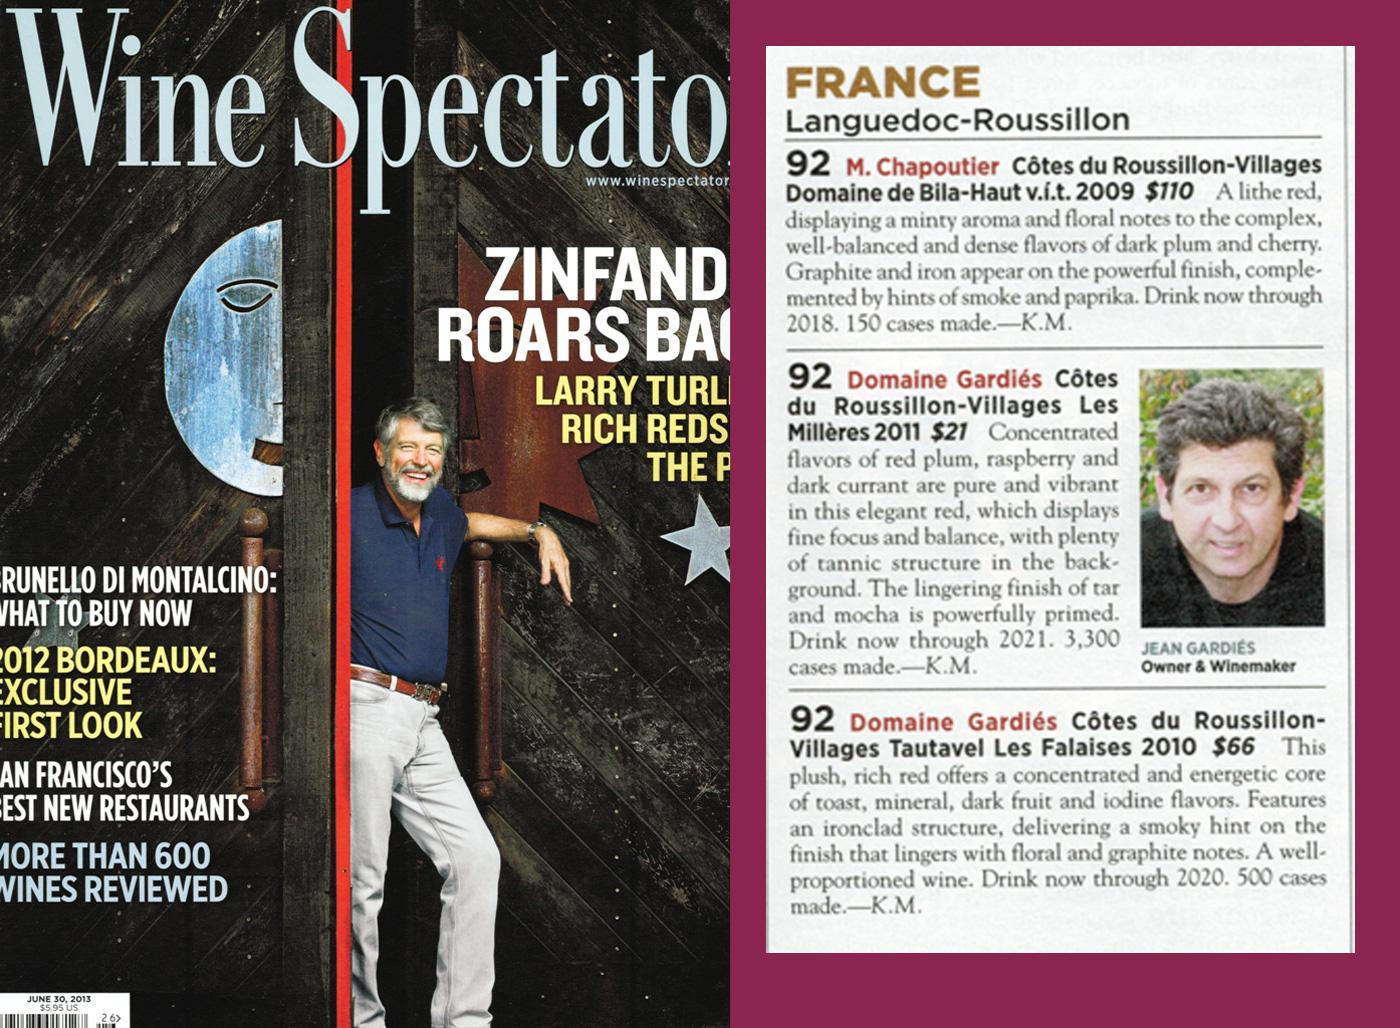 Wine Spectator - June 2013